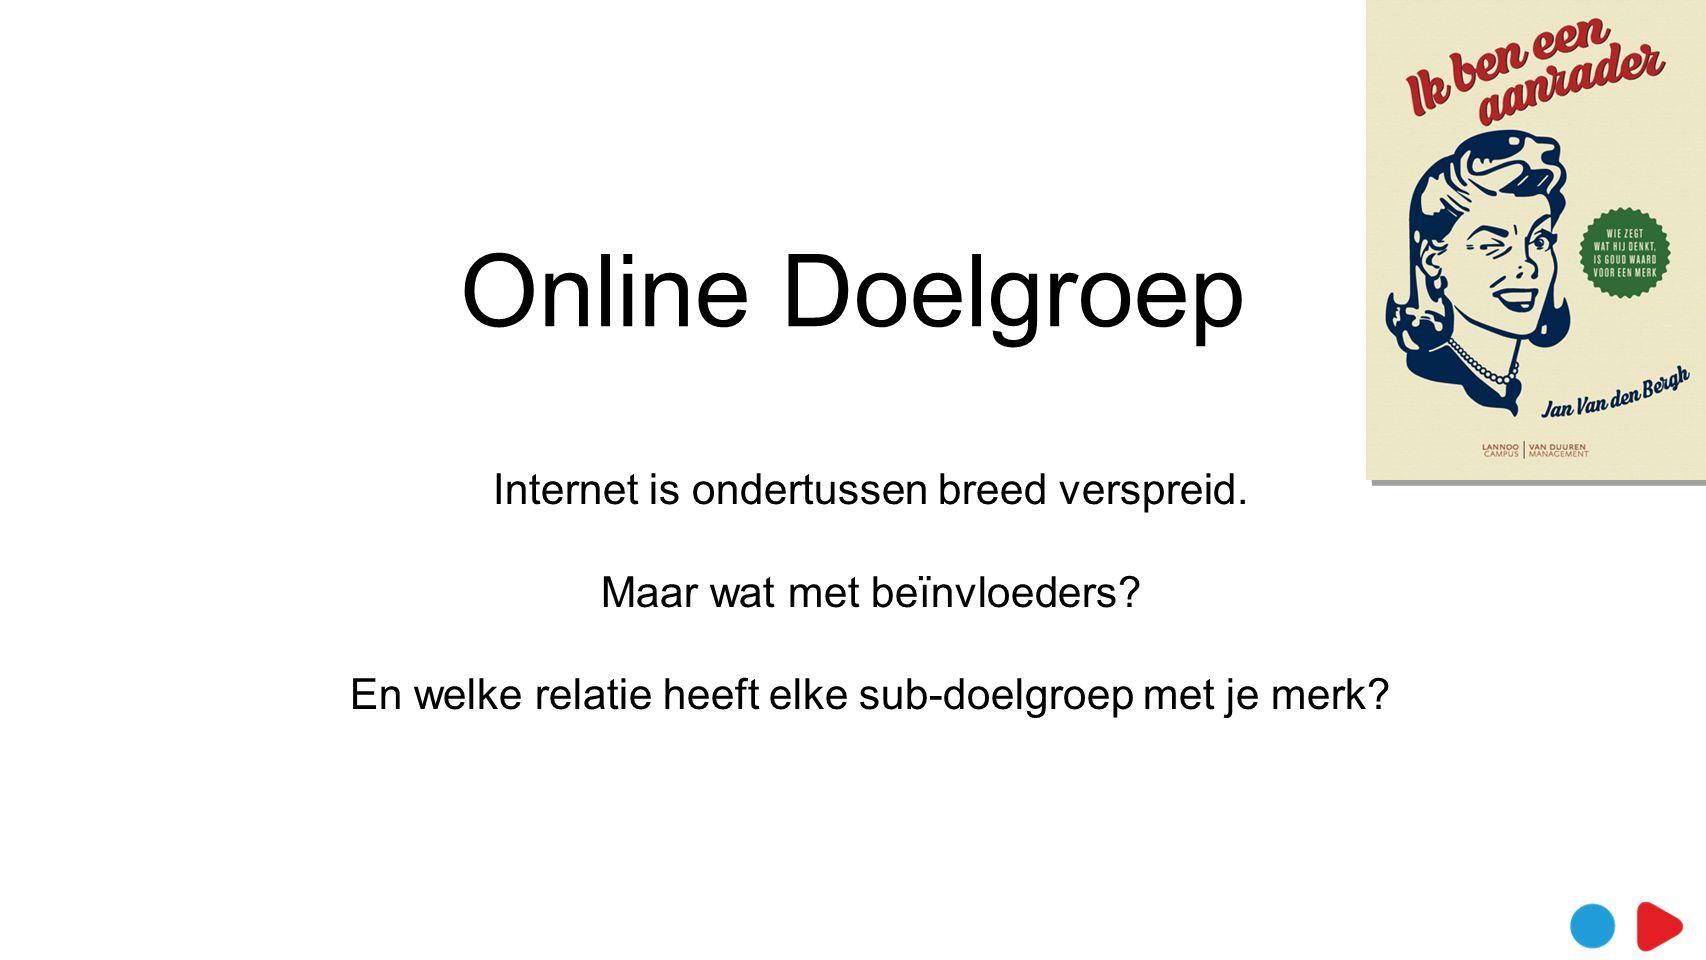 Online Doelgroep